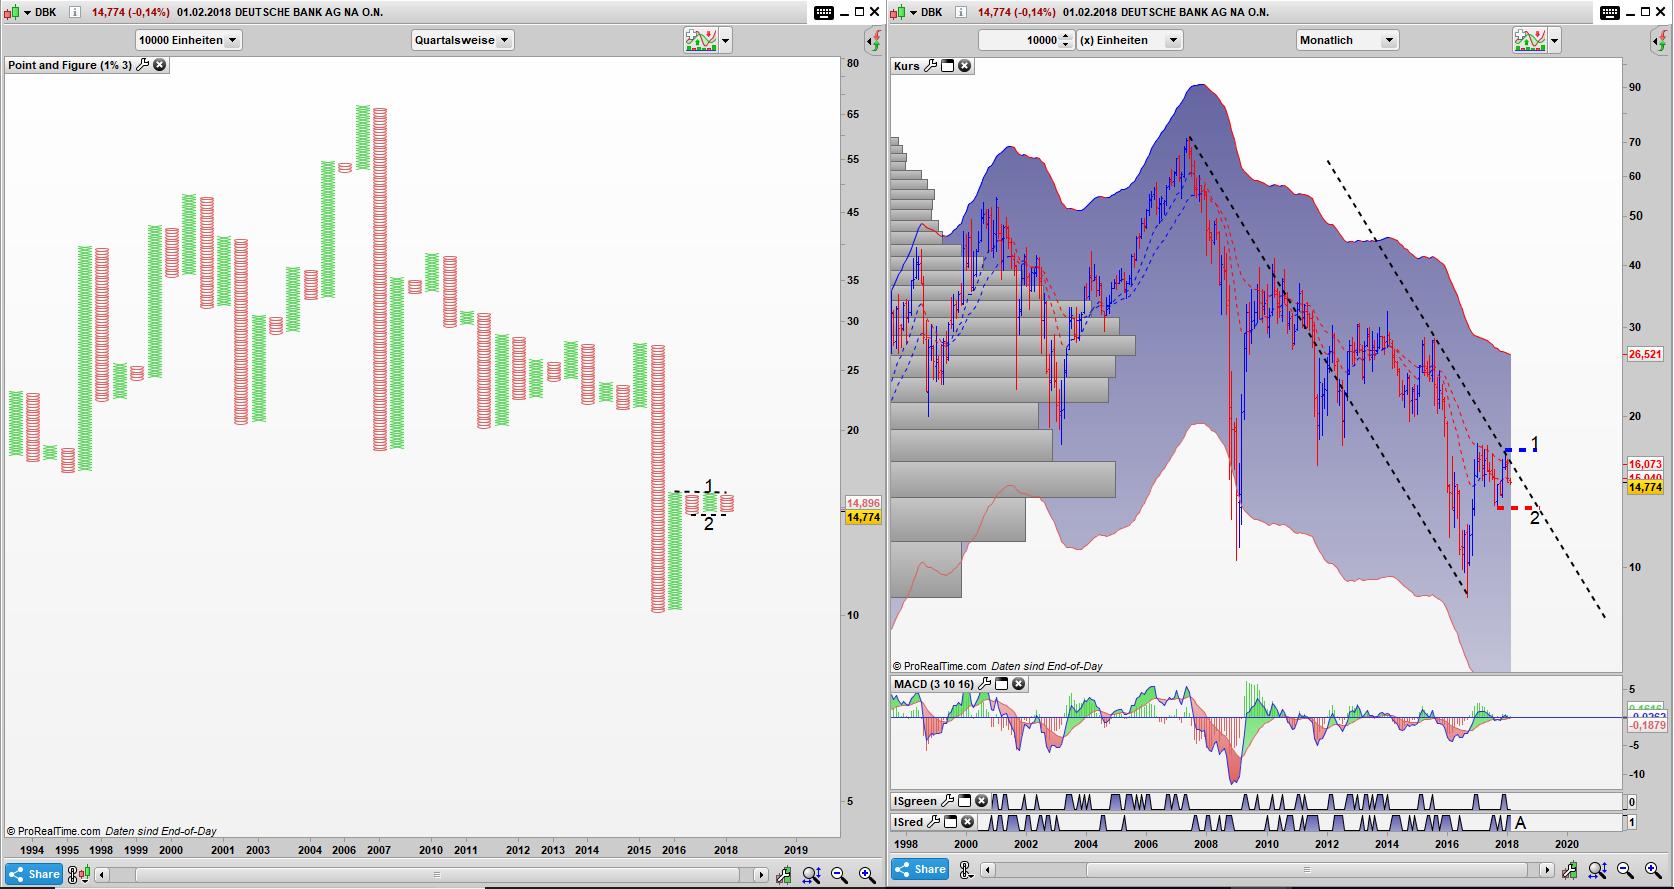 DBK Point and Figure Quartals Chart bei Deutsche Bank nach Quartalszahlen